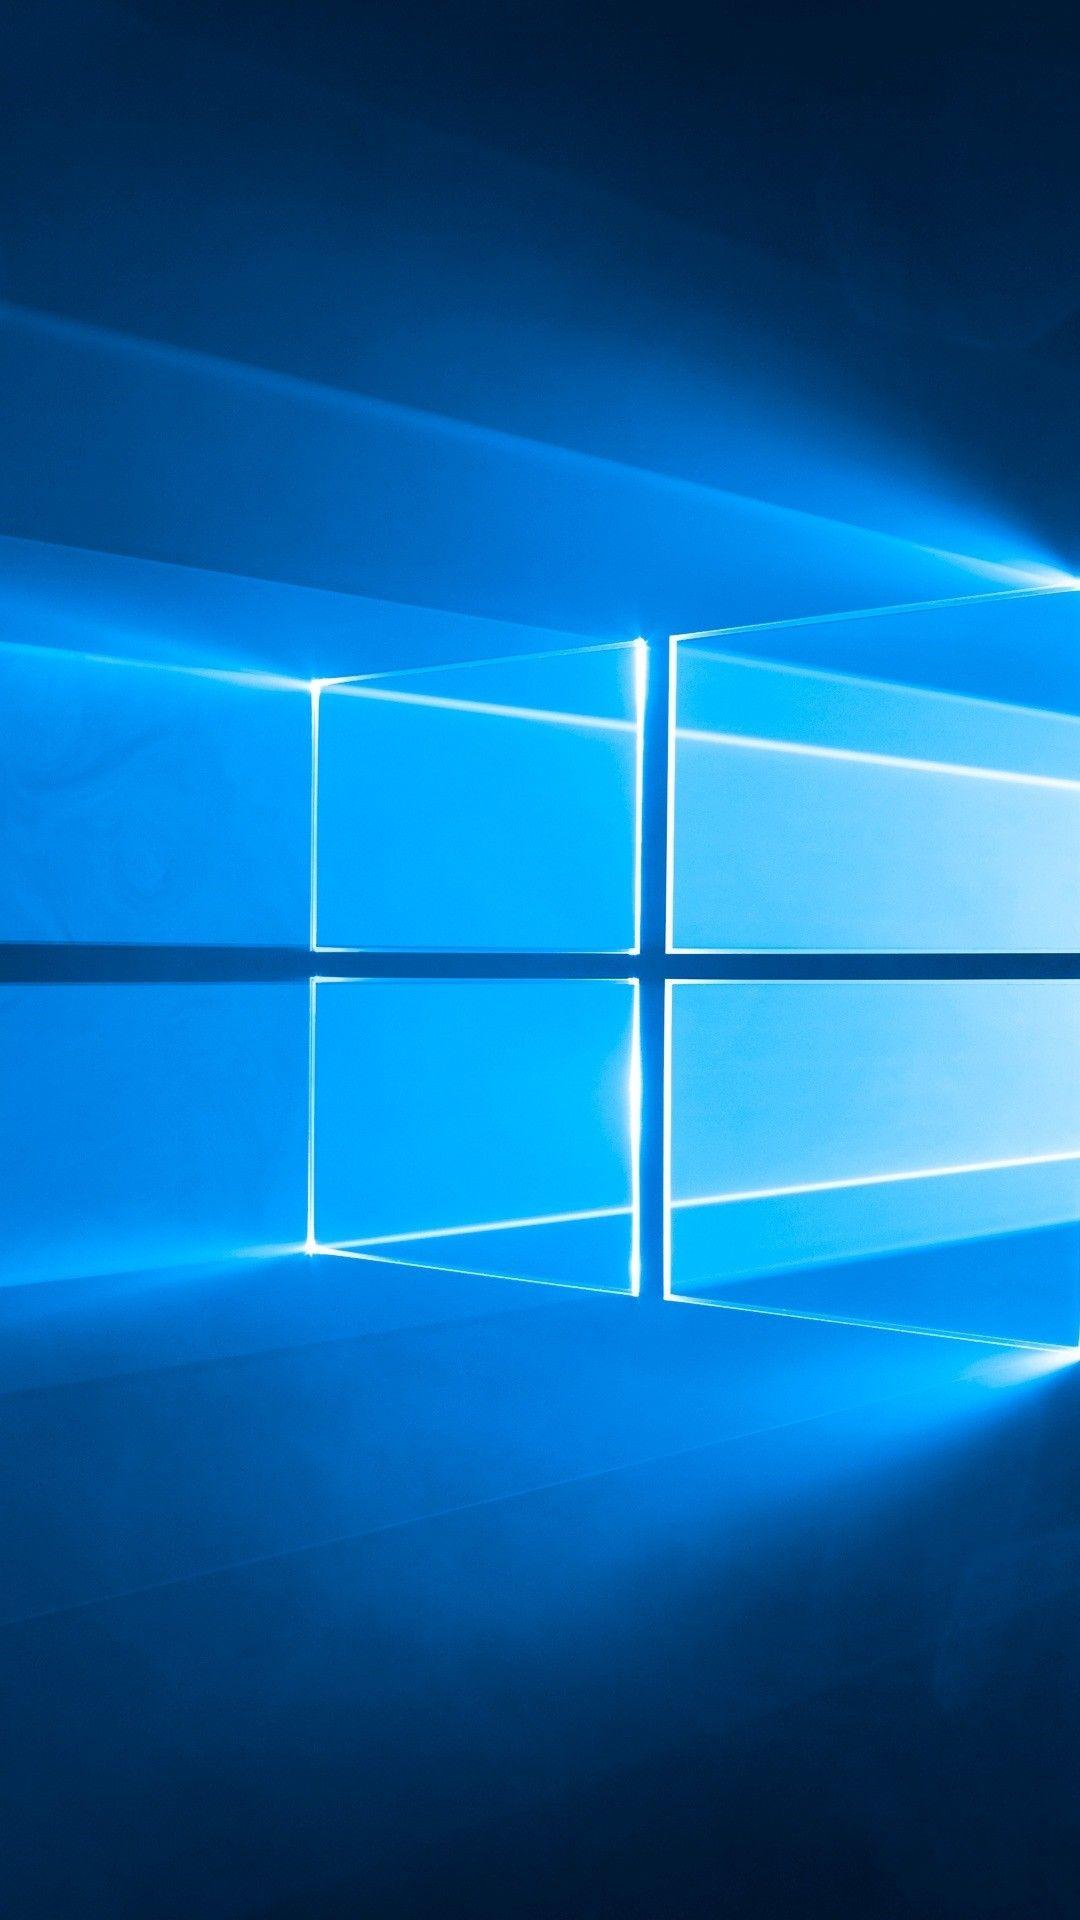 1080x1920 Windows 10 Hd Wallpaper For Desktop Microsoft Wallpaper Minimalist Desktop Wallpaper Windows Desktop Wallpaper